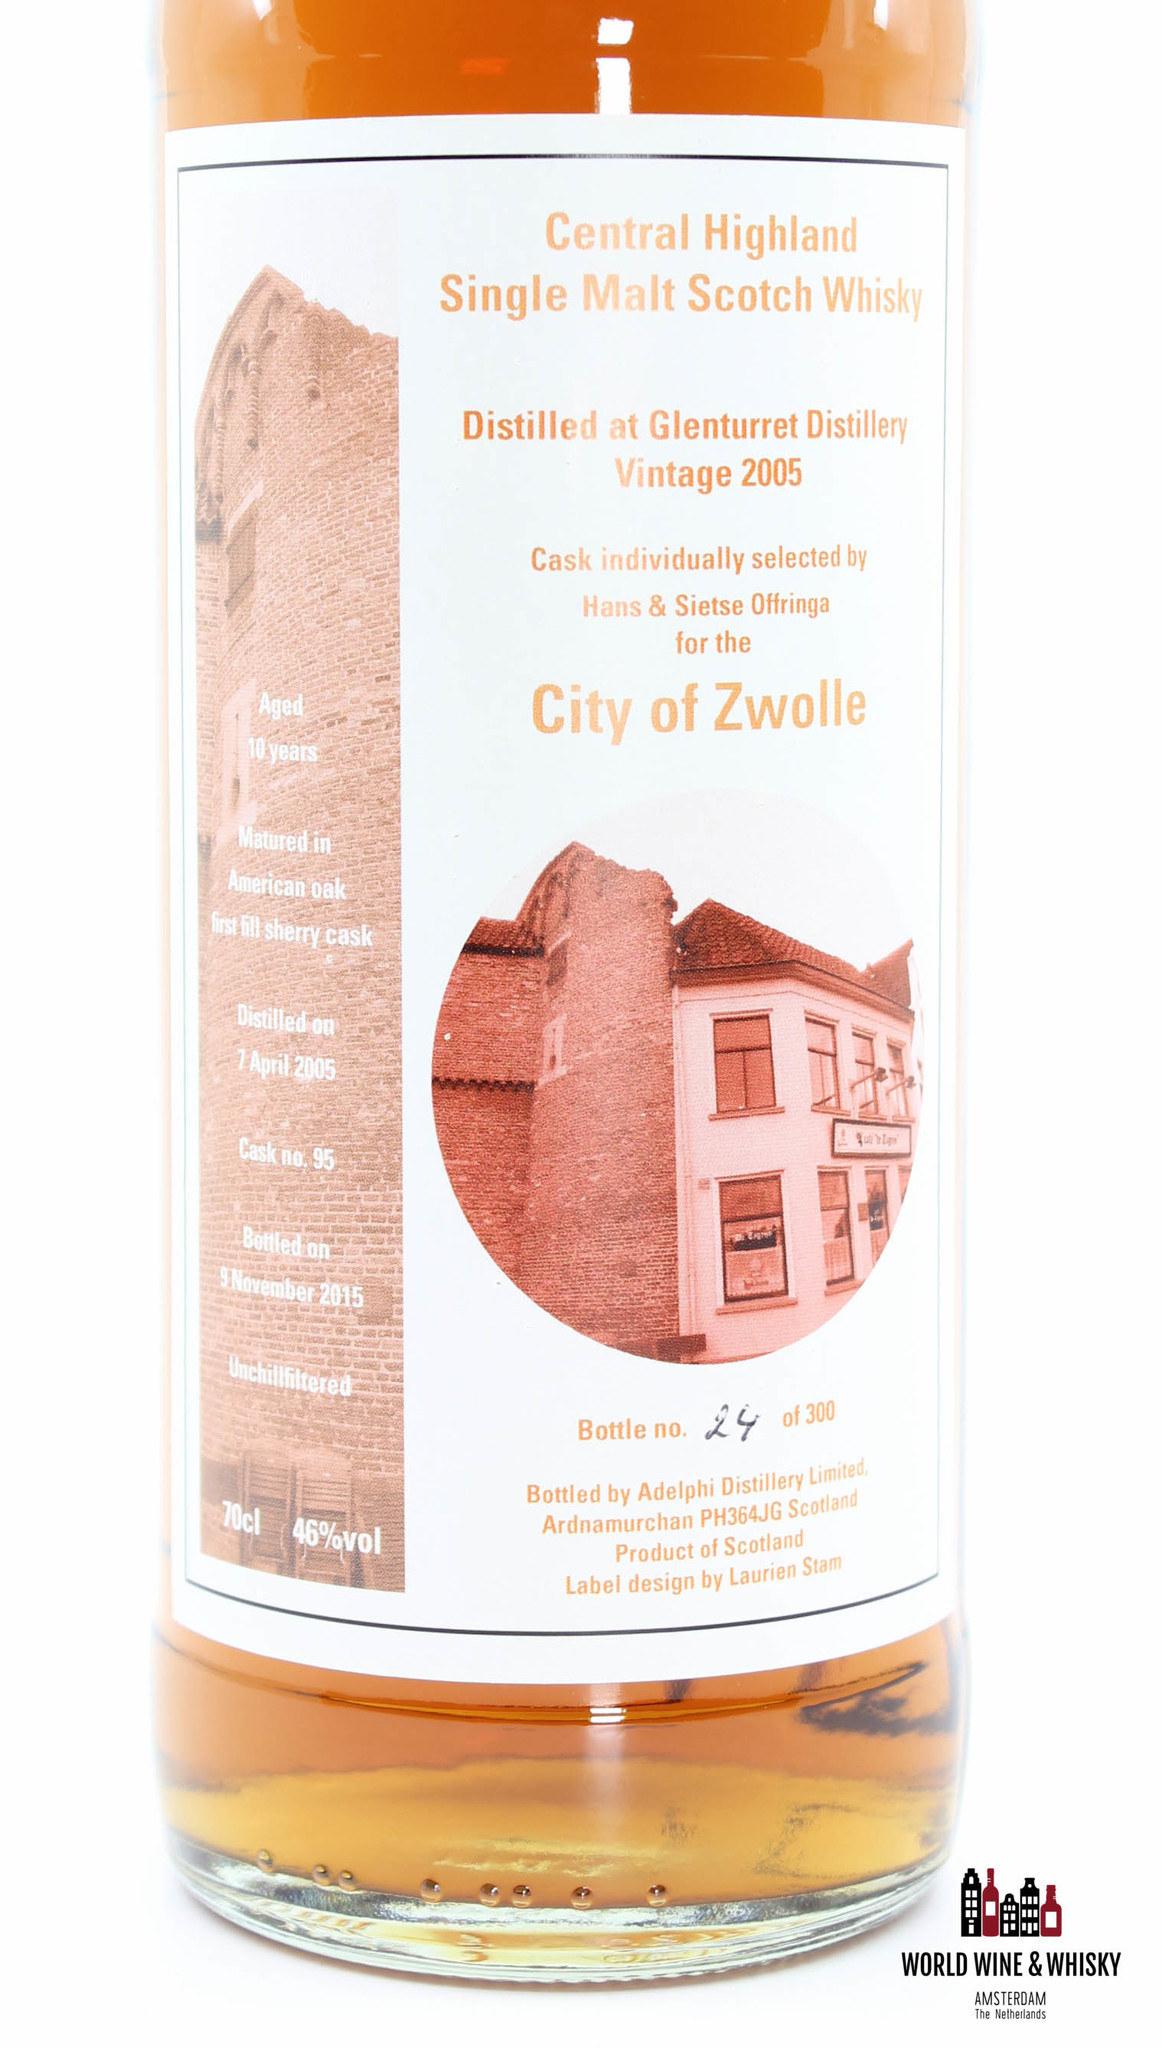 Glenturret Glenturret 10 Years Old 2005 2015 - City of Zwolle - Adelphi - Cask 95 46%